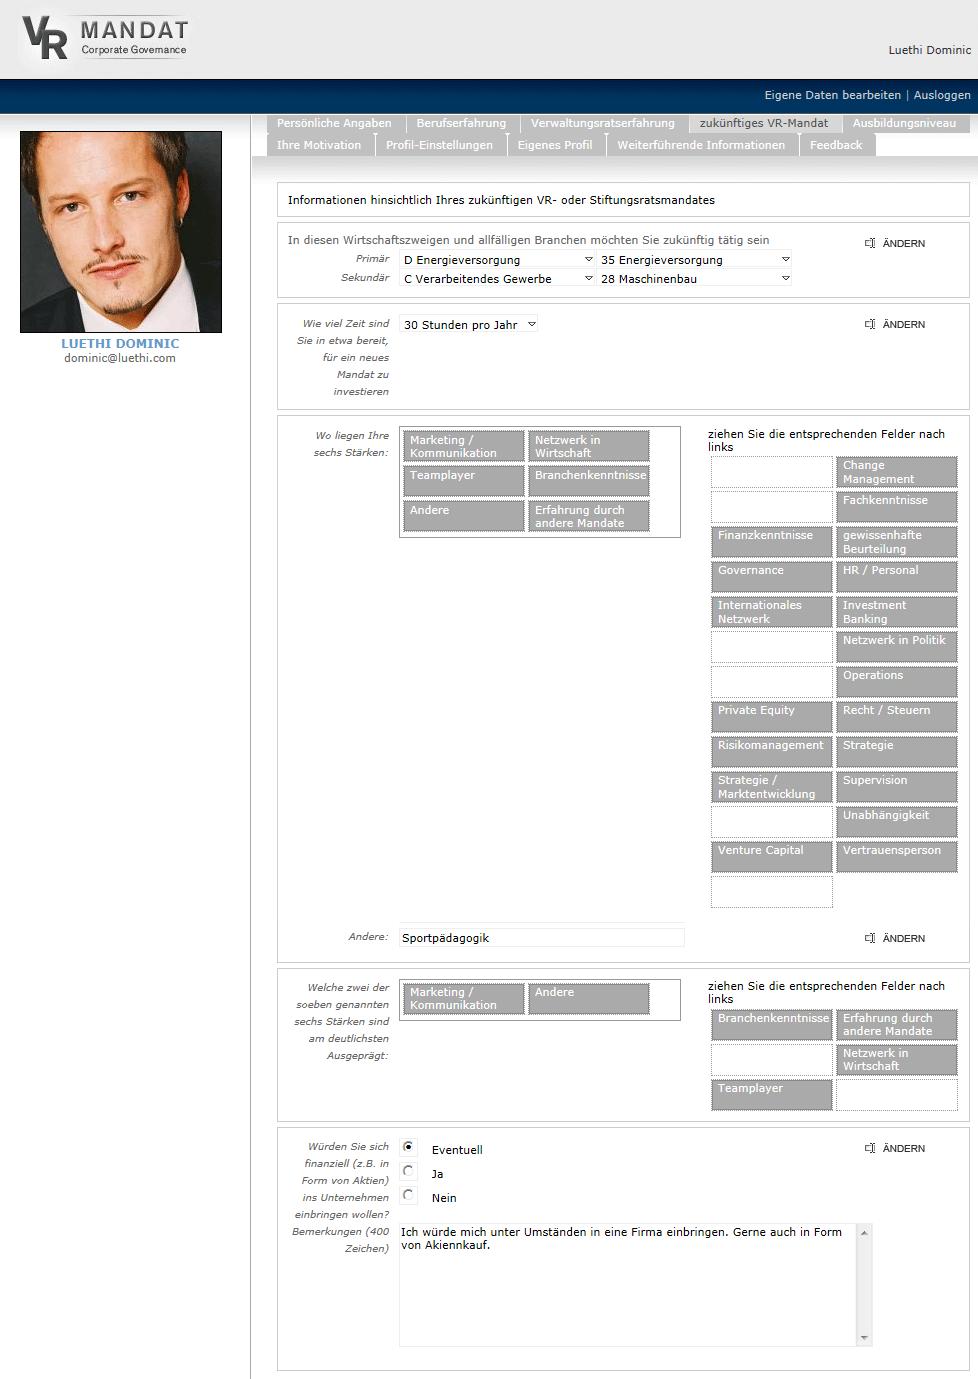 Profil eines Verwaltungsrats bei VRMandat.com